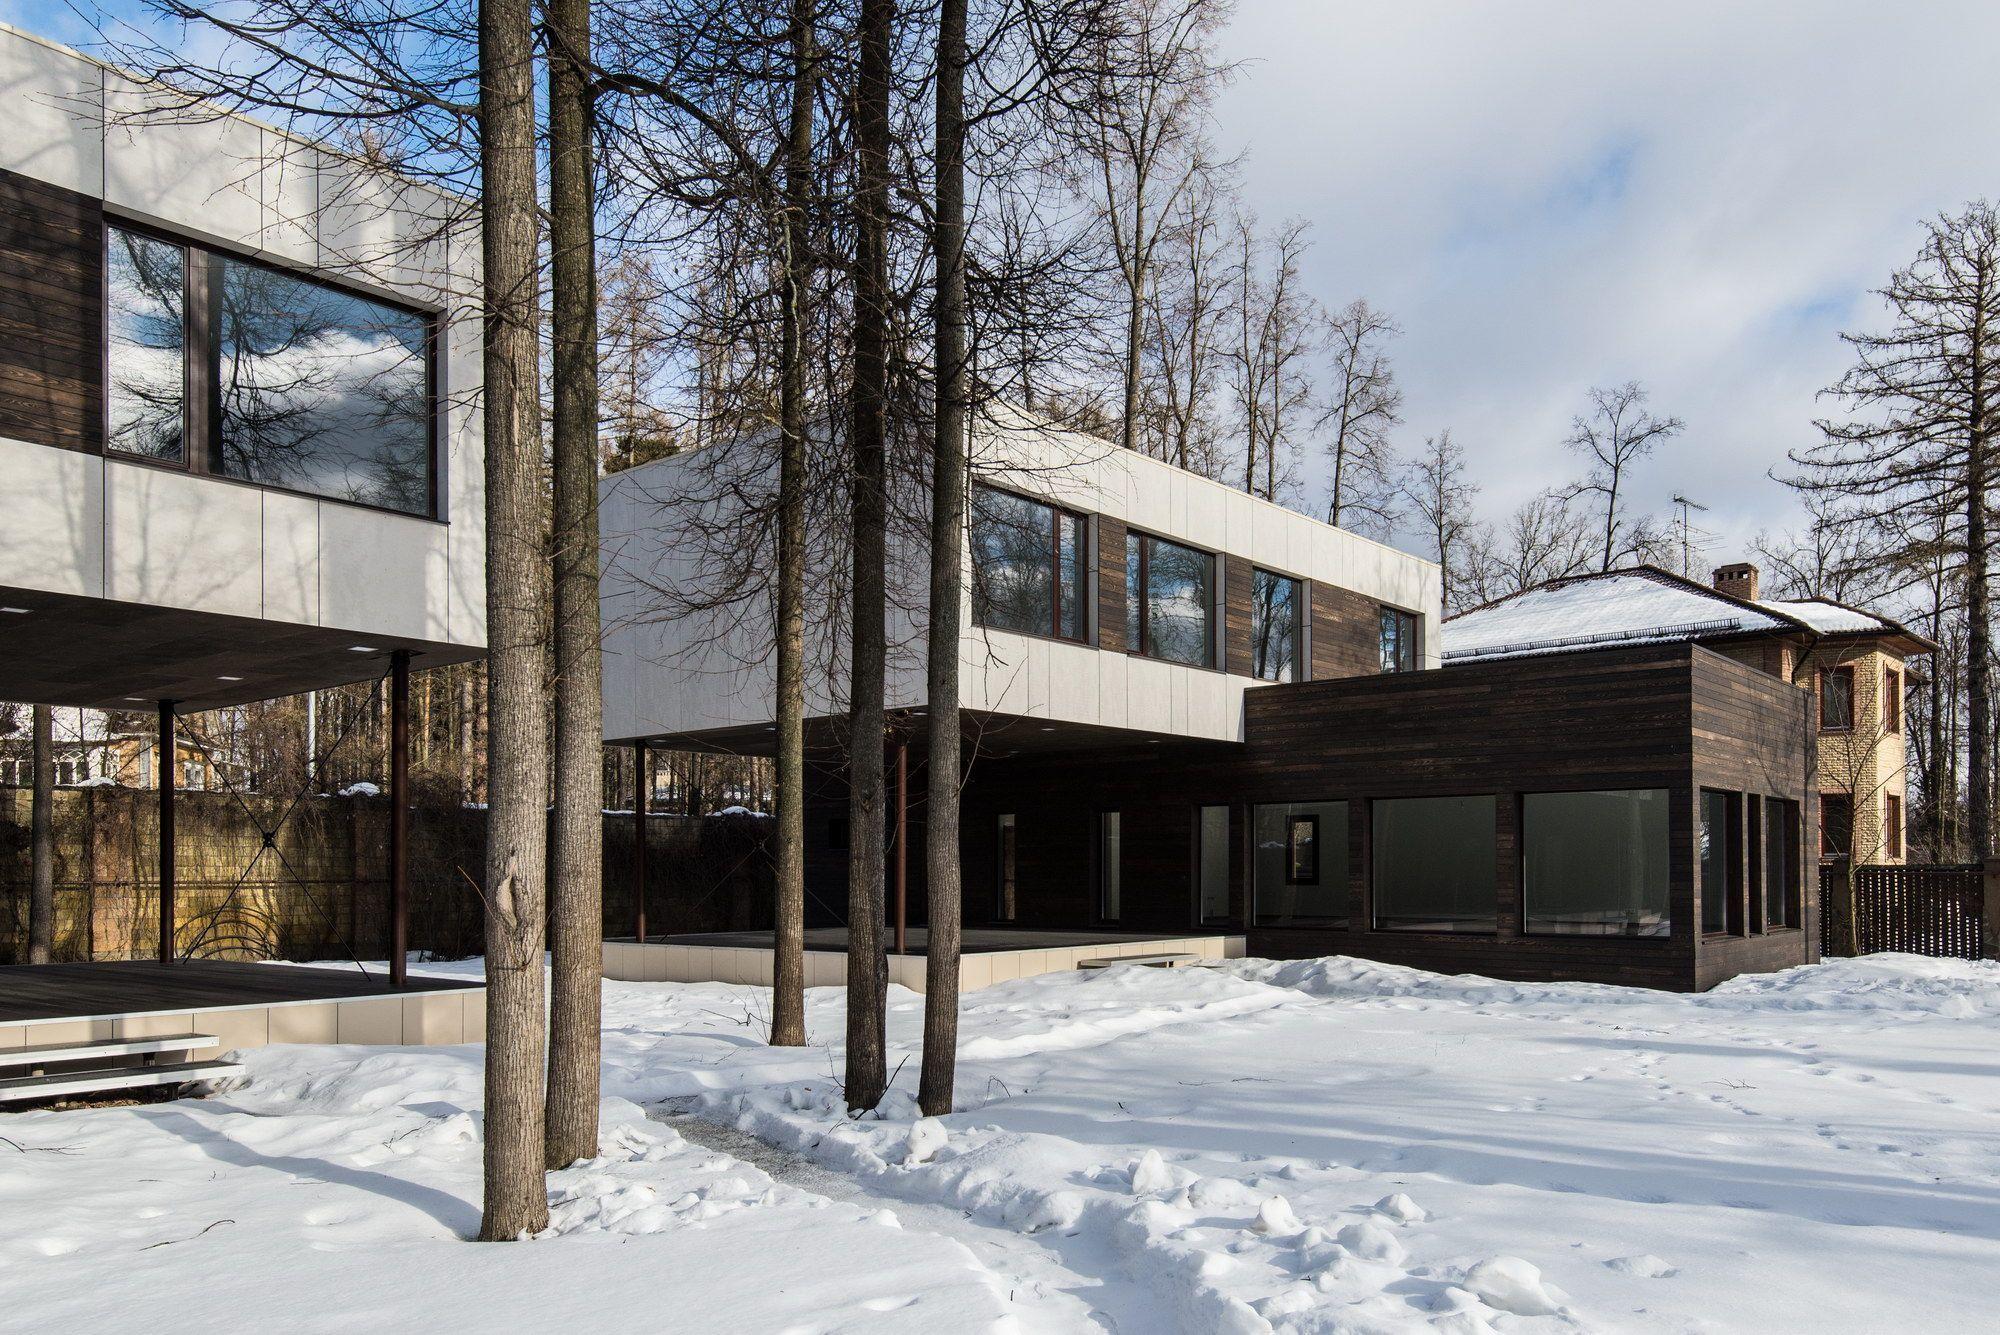 Проект загородного дома в стиле минимализм